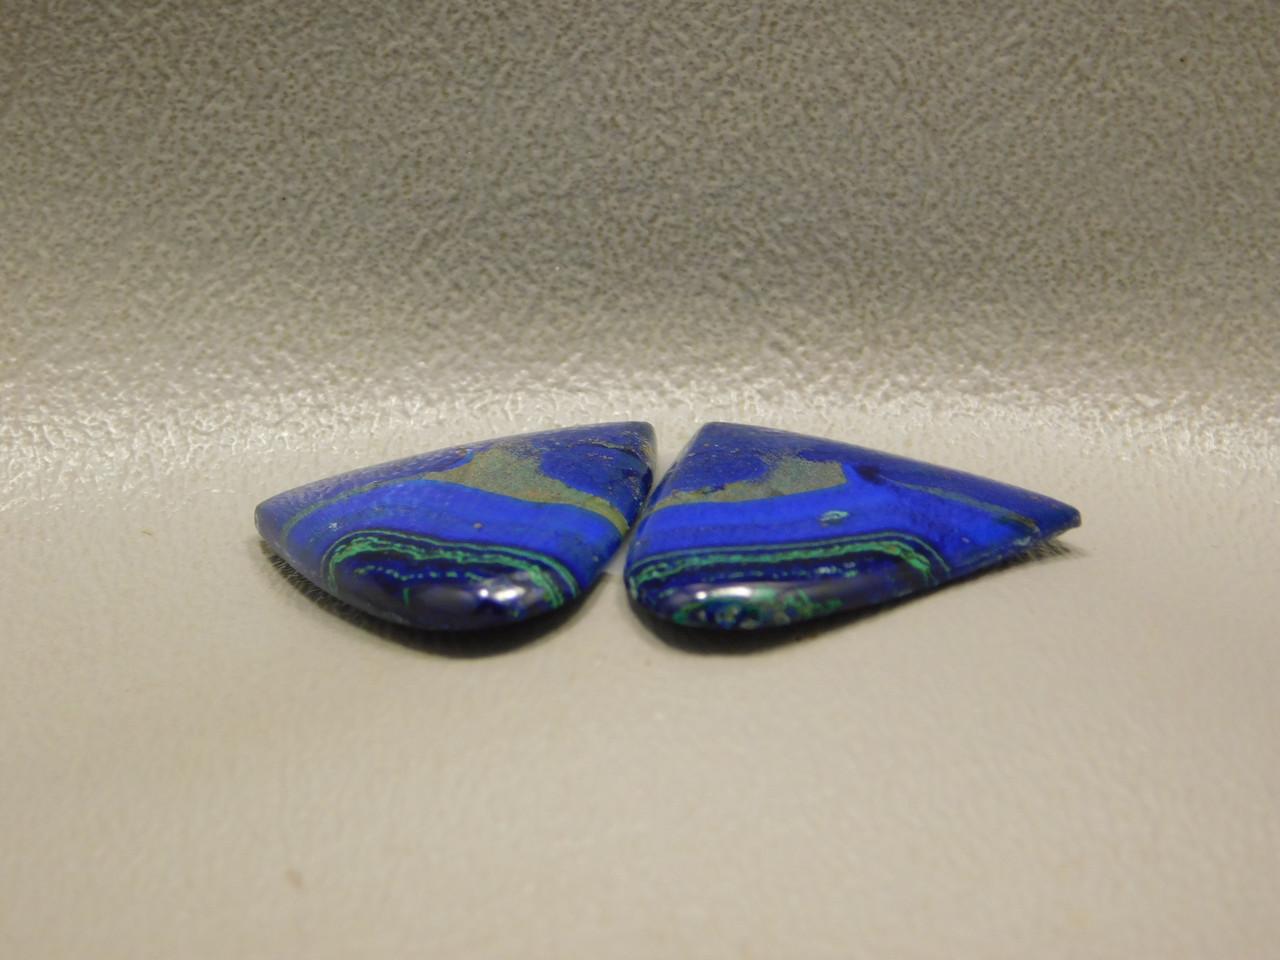 Azurite-Malachite Matched Pairs Cabochons Semiprecious Stones #6